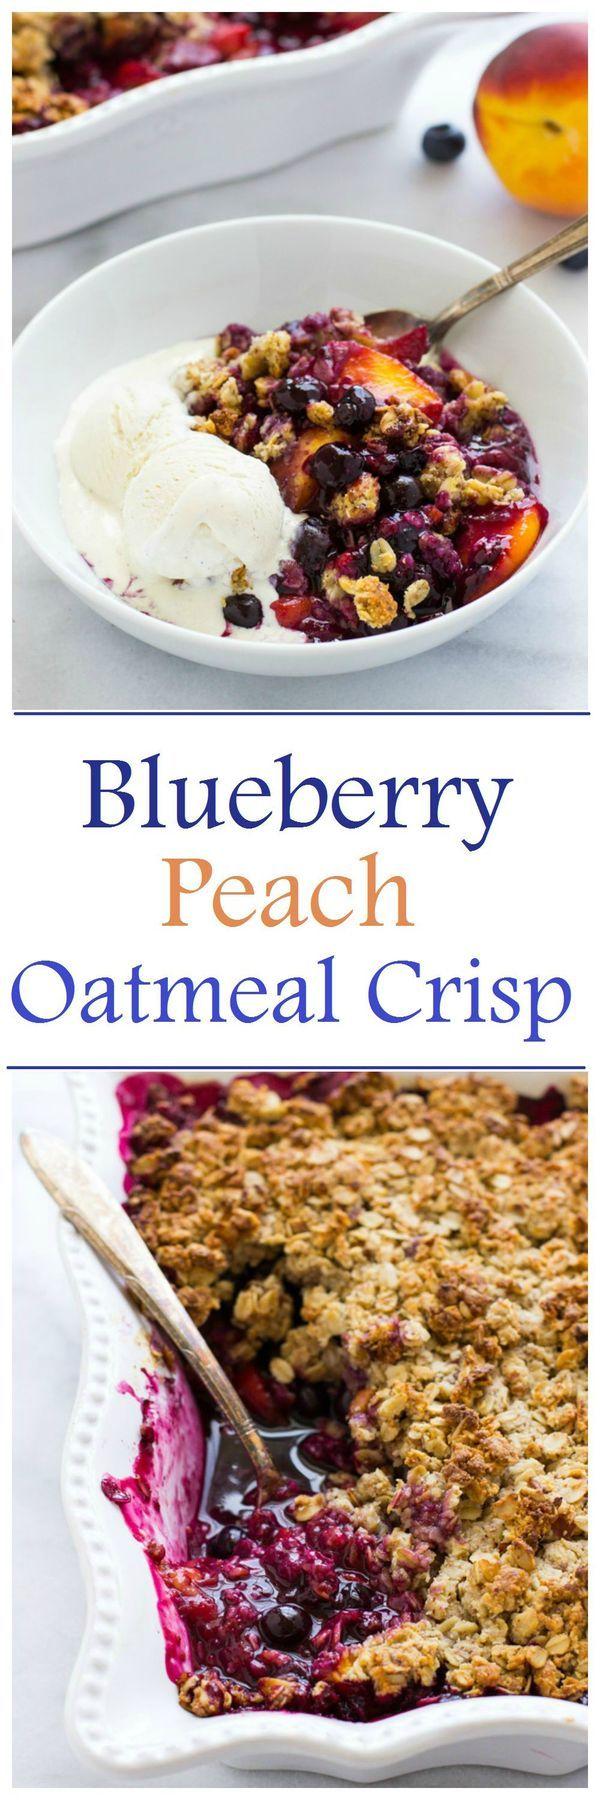 Blueberry Peach Oatmeal Crisp- the perfect summer dessert! #refinedsugarfree #glutenfree #dairyfree